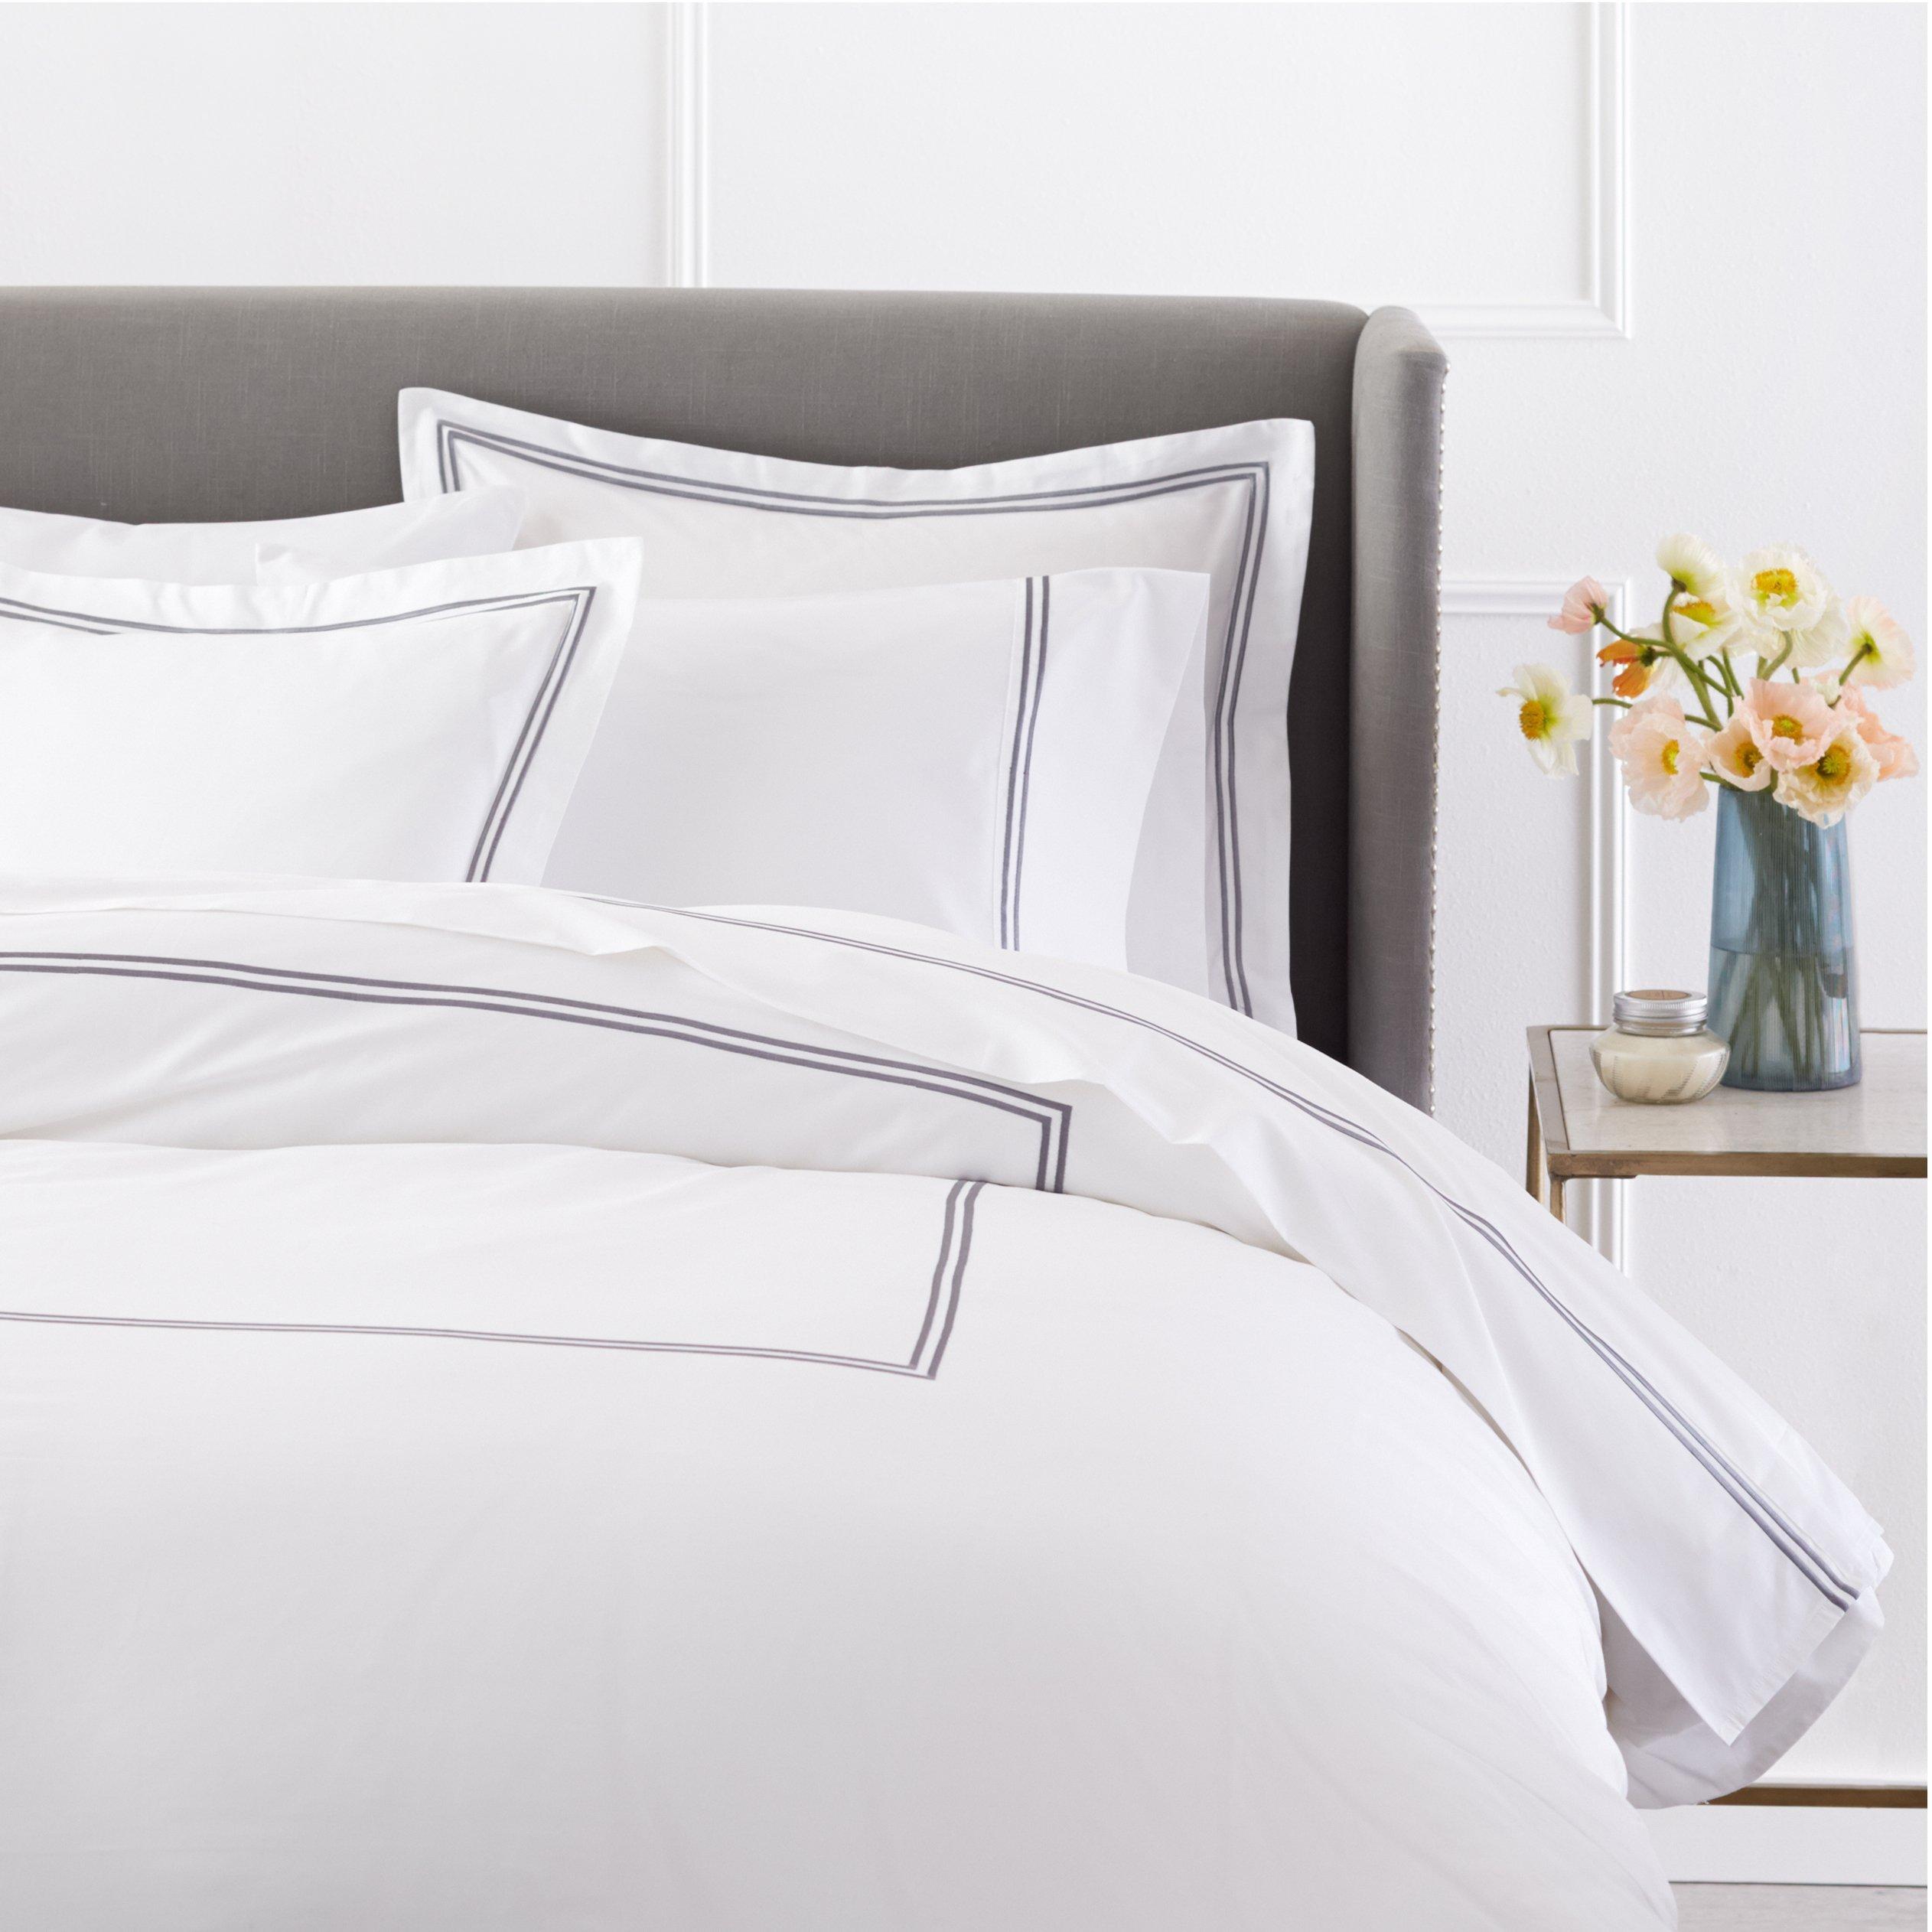 Pinzon 400-Thread-Count Egyptian Cotton Sateen Hotel Stitch Duvet Cover - King, Silver Grey